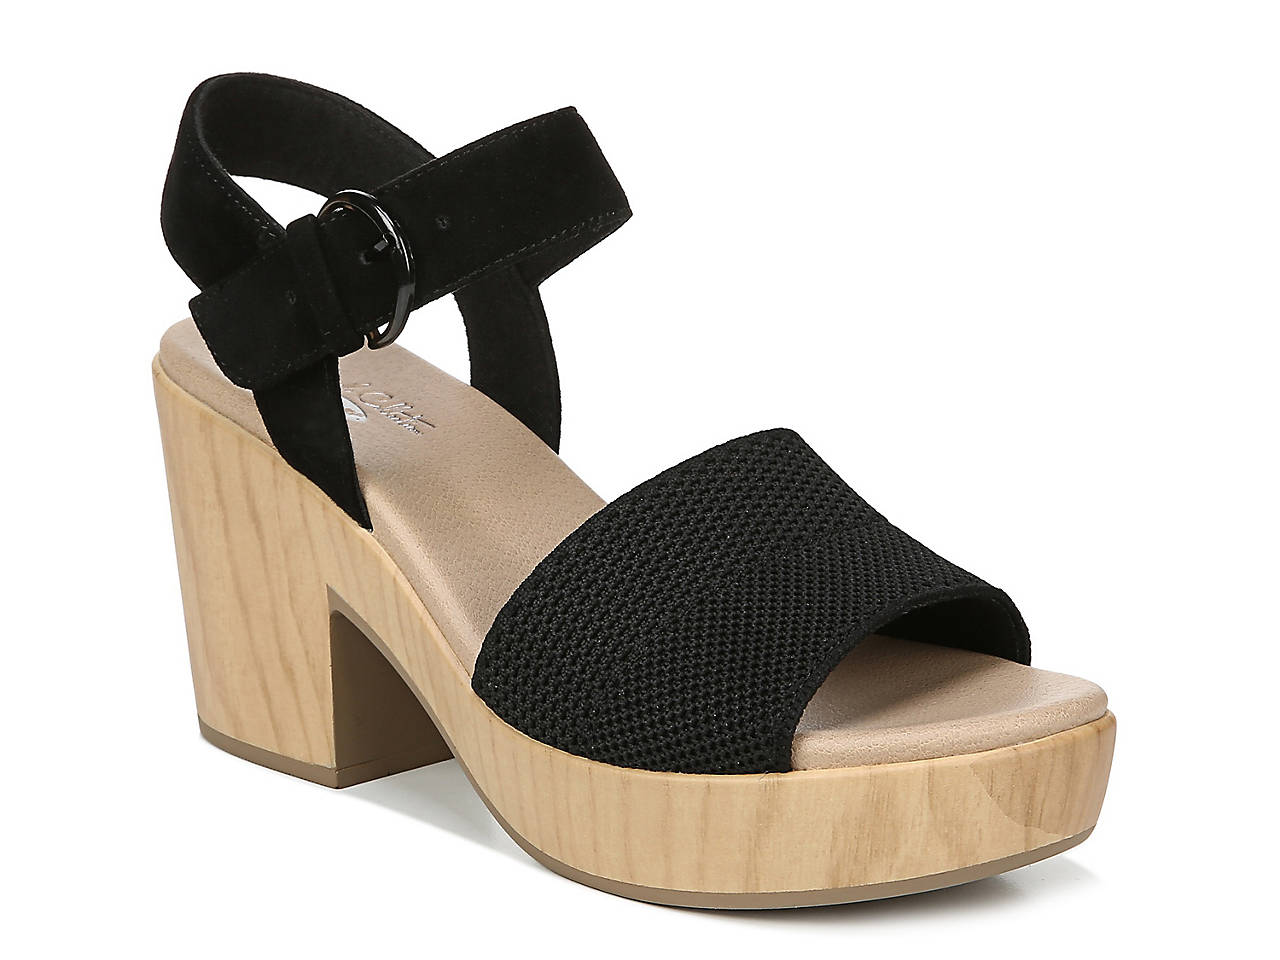 5ad49d7e3b97 Dr. Scholl s Brickell Platform Sandal Women s Shoes